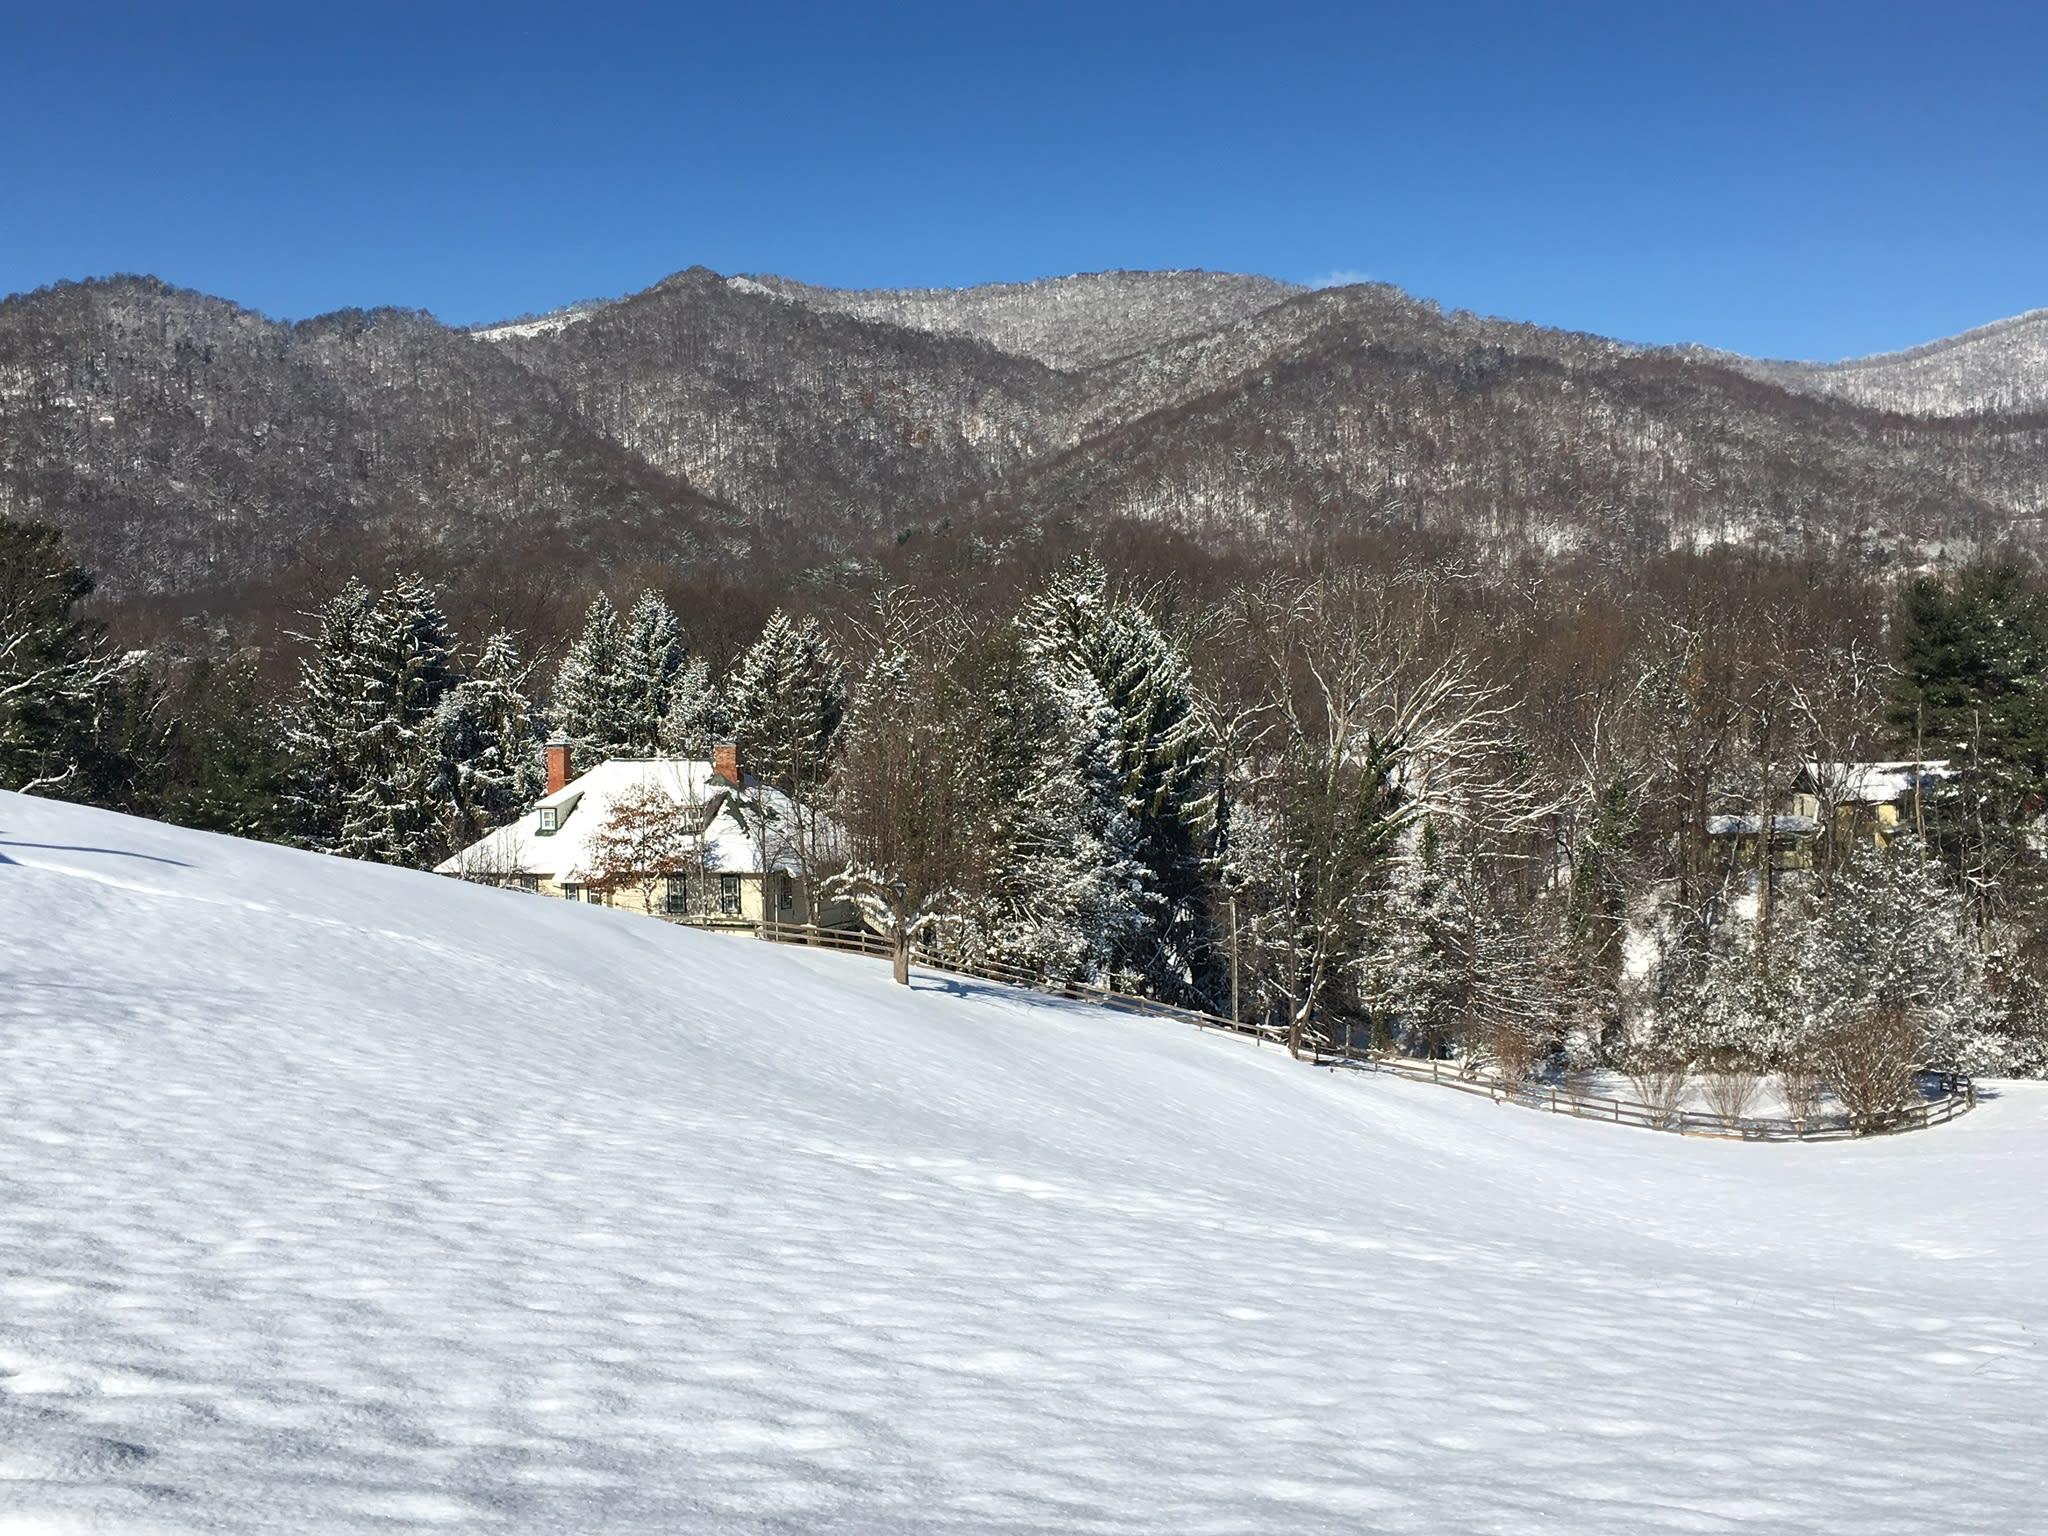 Why Not Plan A Winter Getaway?